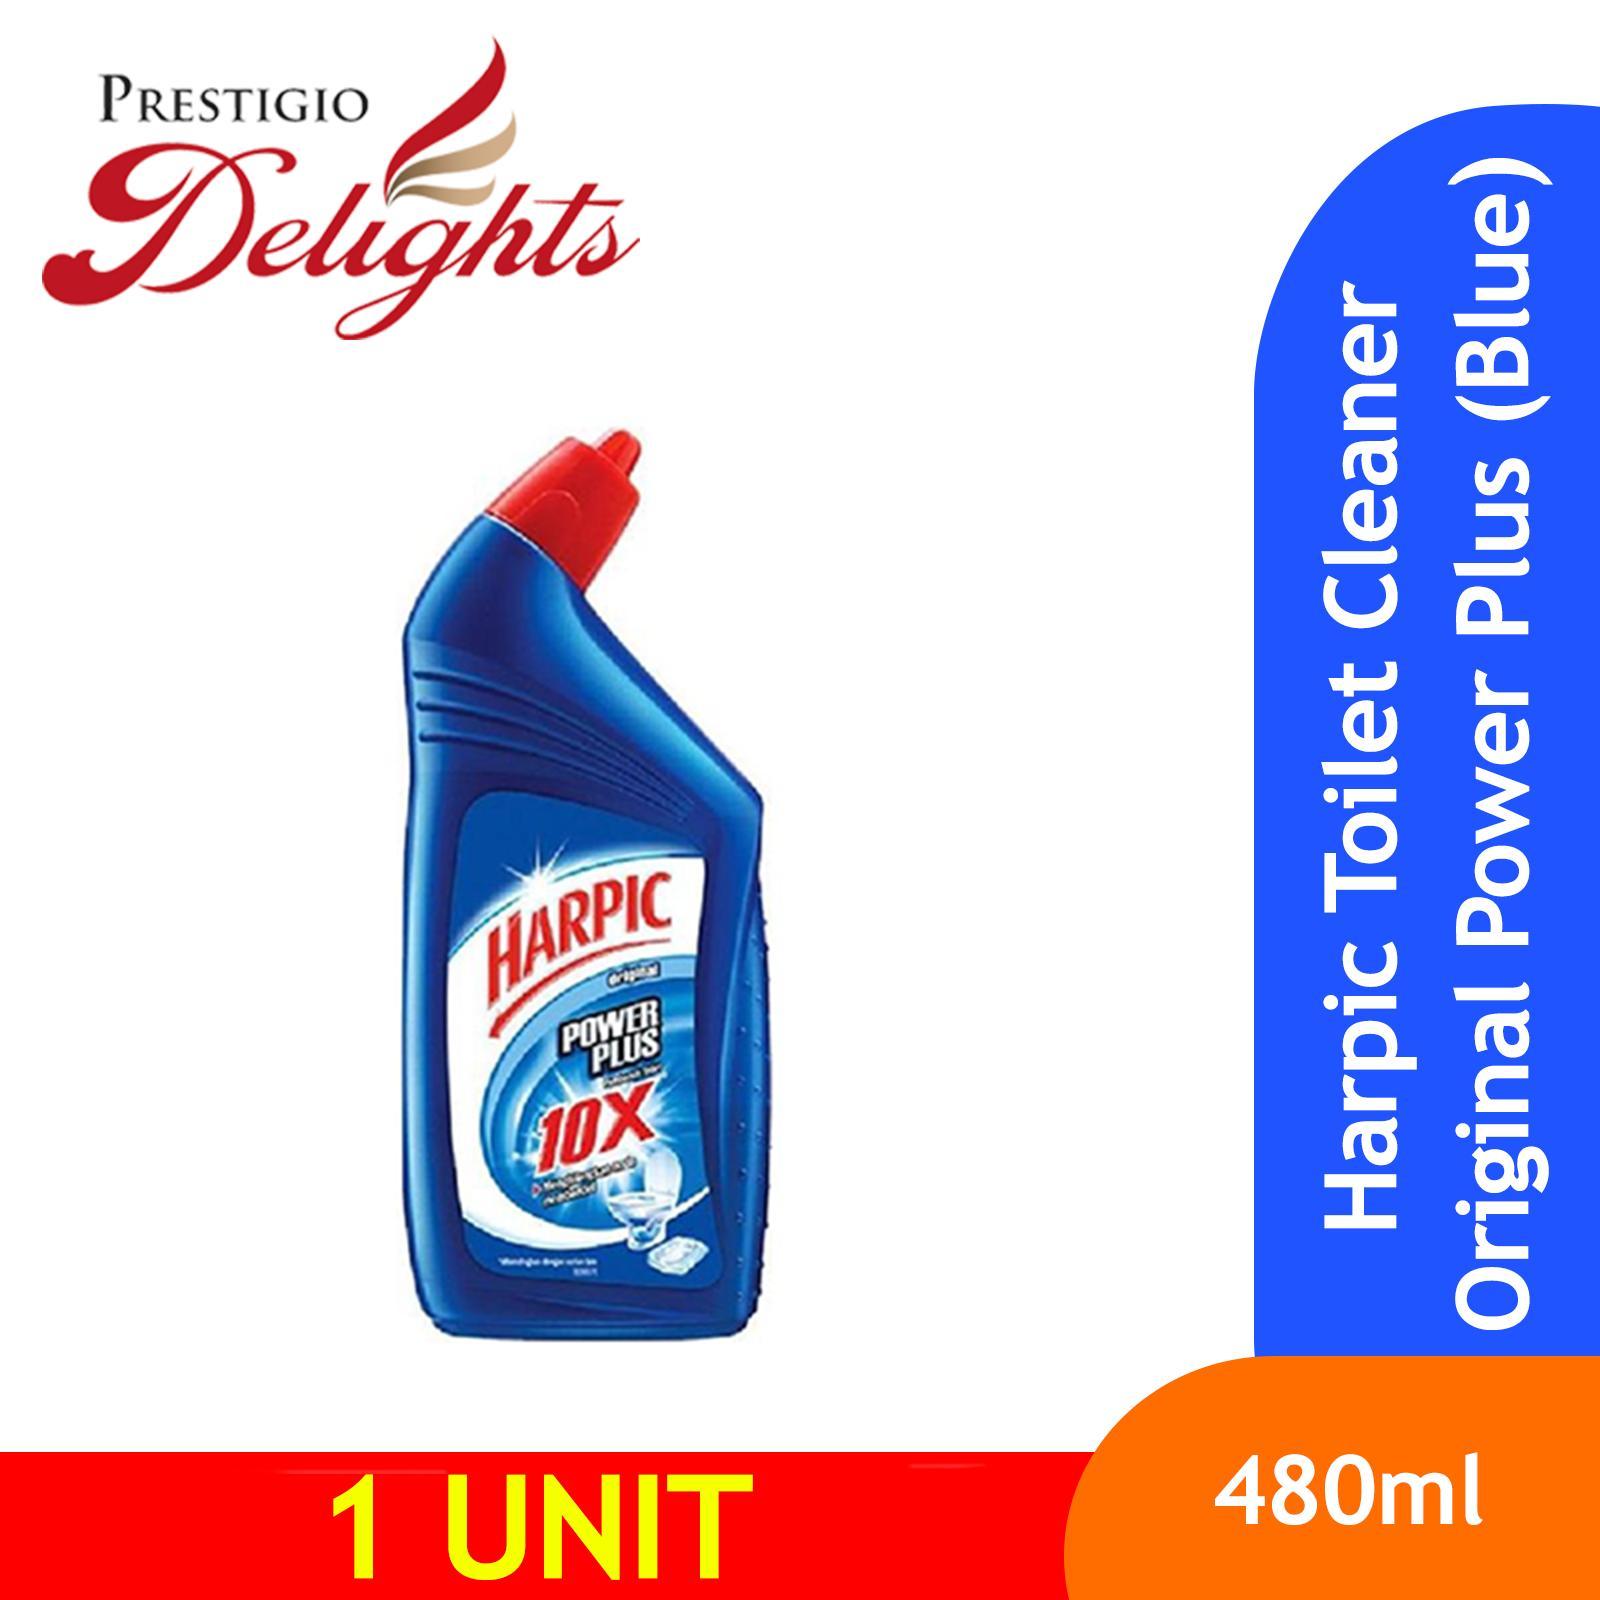 Harpic Toilet Cleaner Original Power Plus (blue) 450ml By Prestigio Delights.